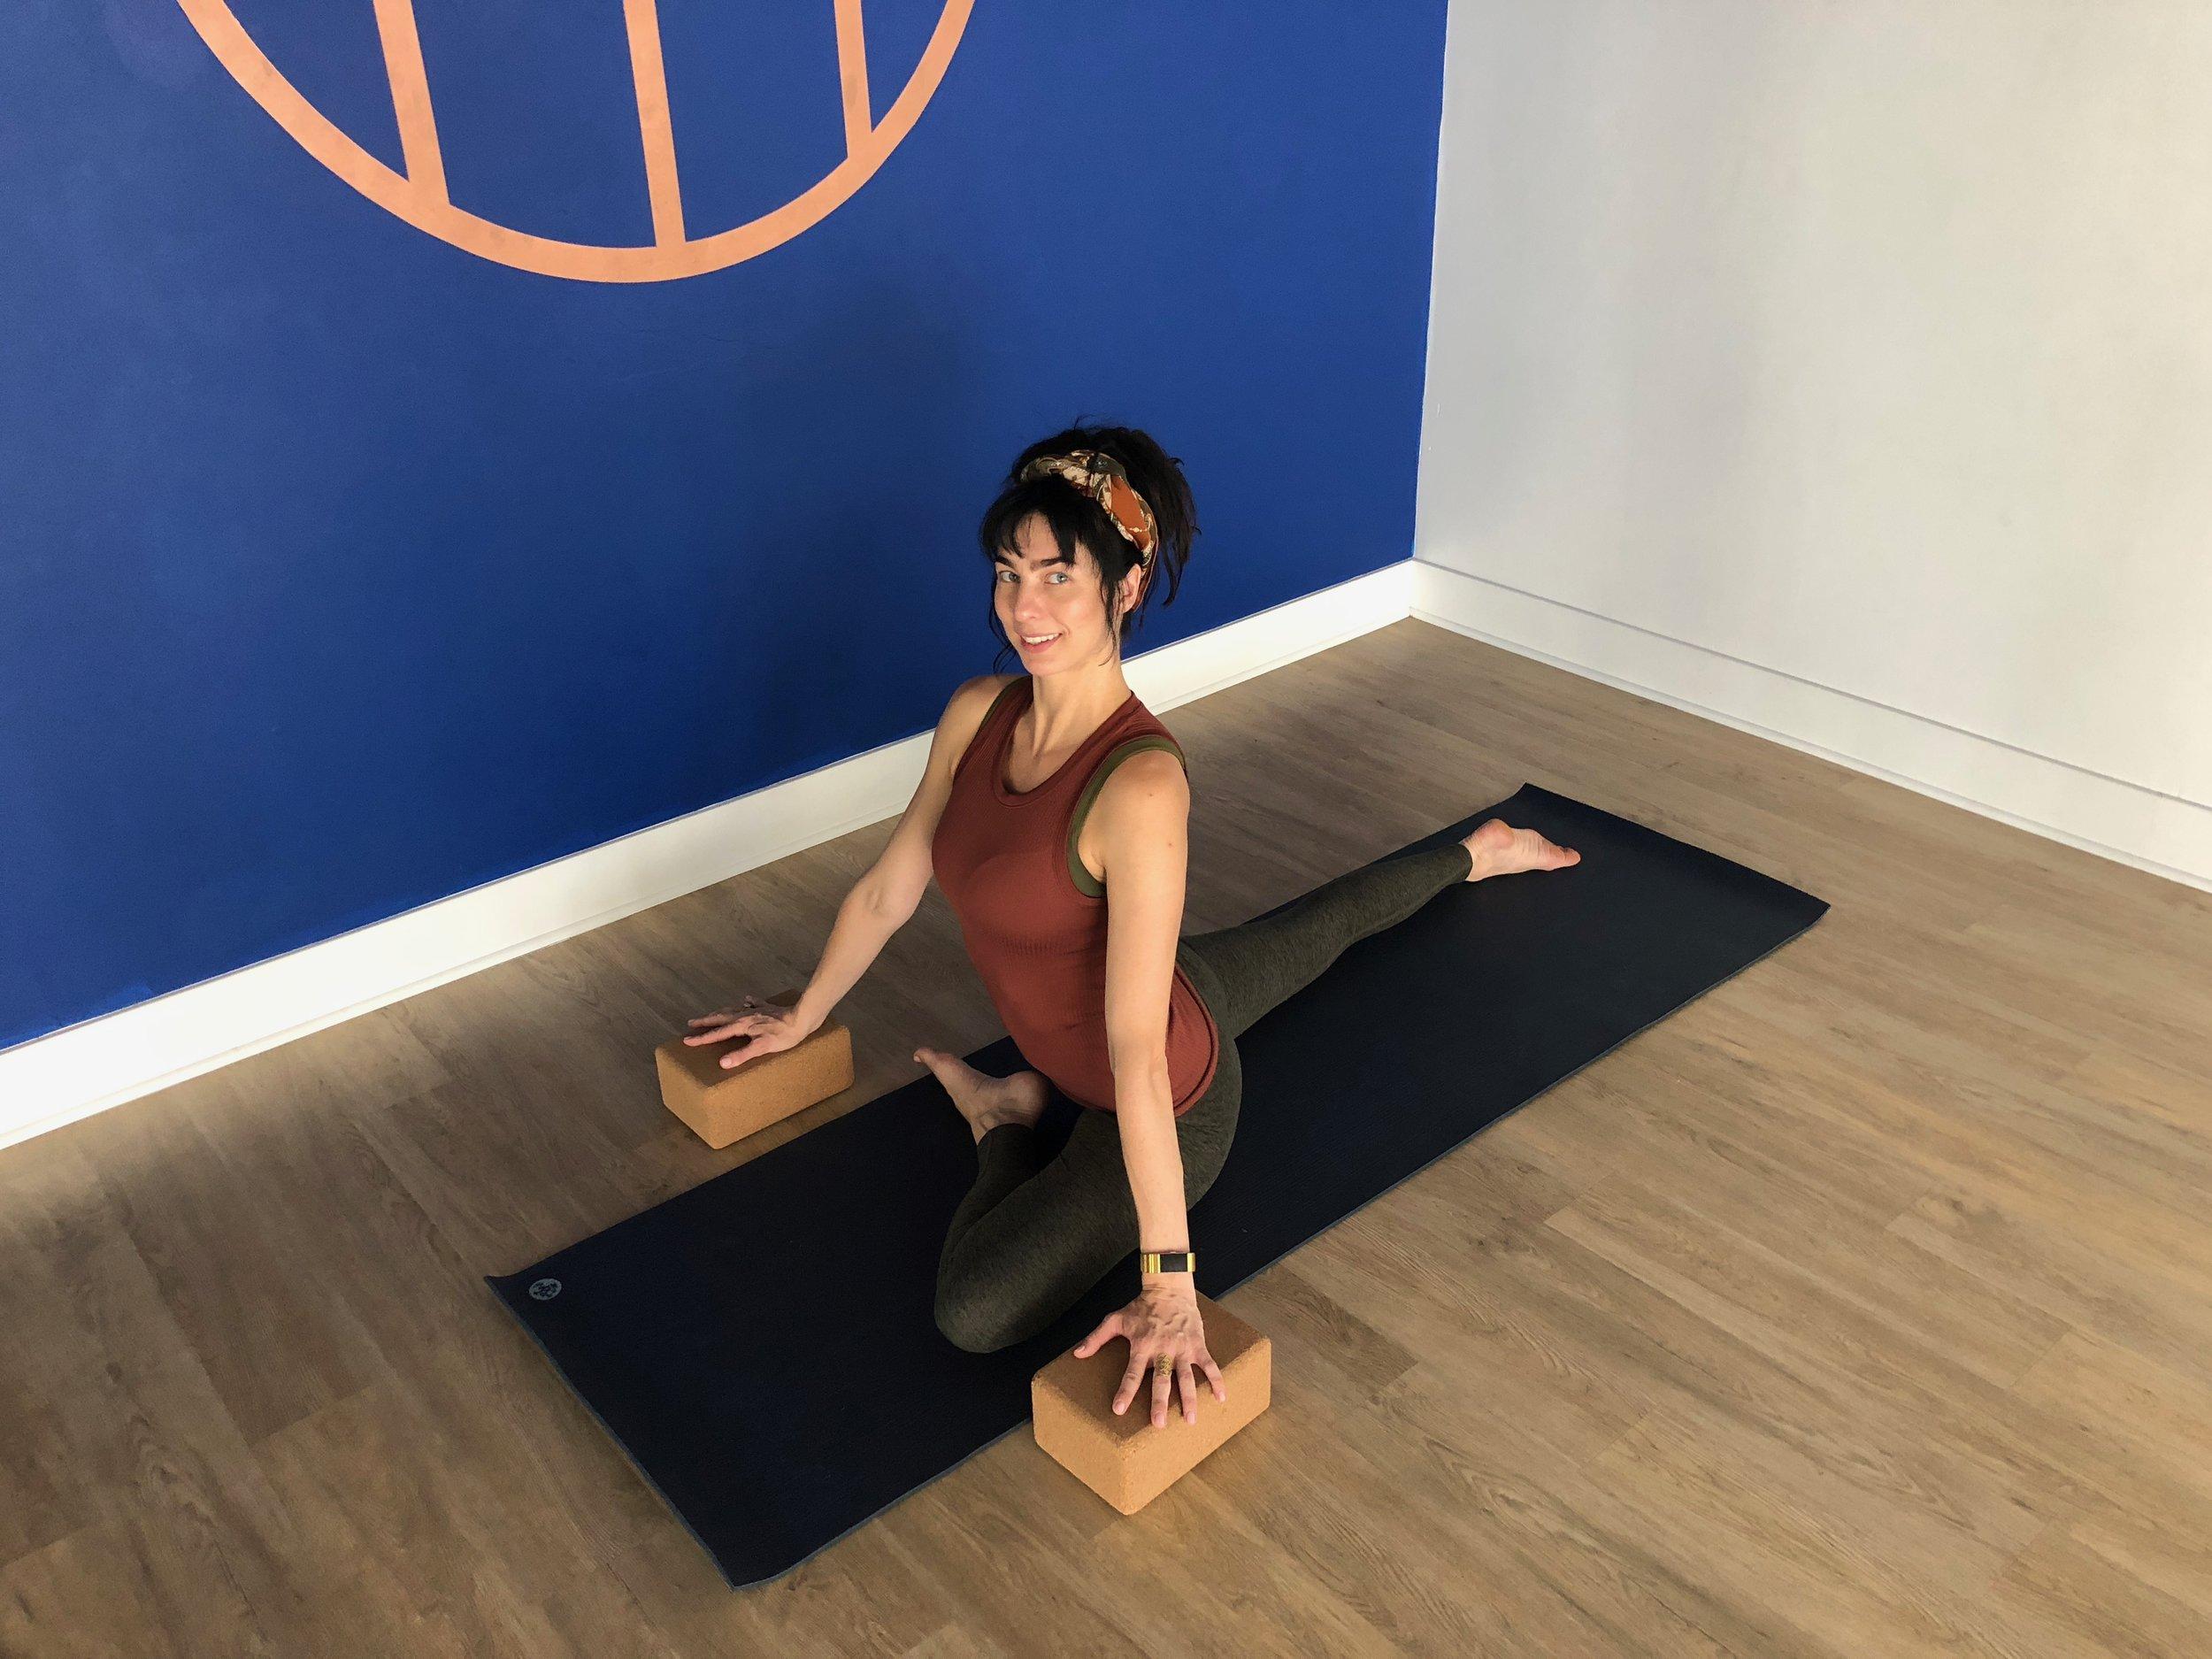 hip therapy, hip pain, yoga for hips, kate monzo yoga, hip fix, vinyasa yoga, yoga workshop, physical therapy marin county, physical therapy corte madera